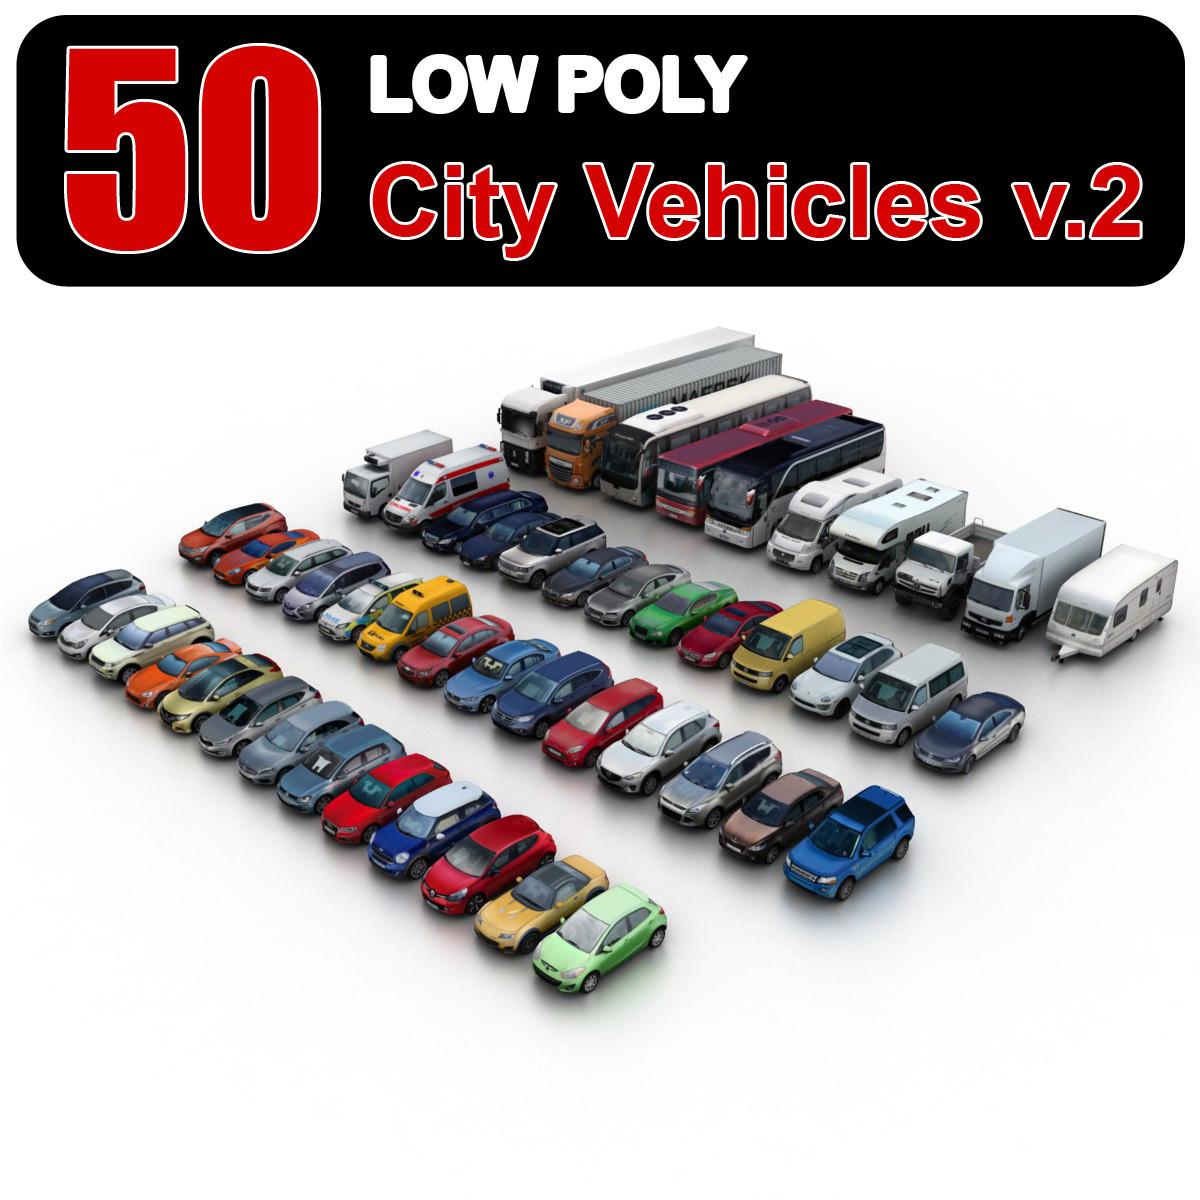 Free 3d models low poly - b